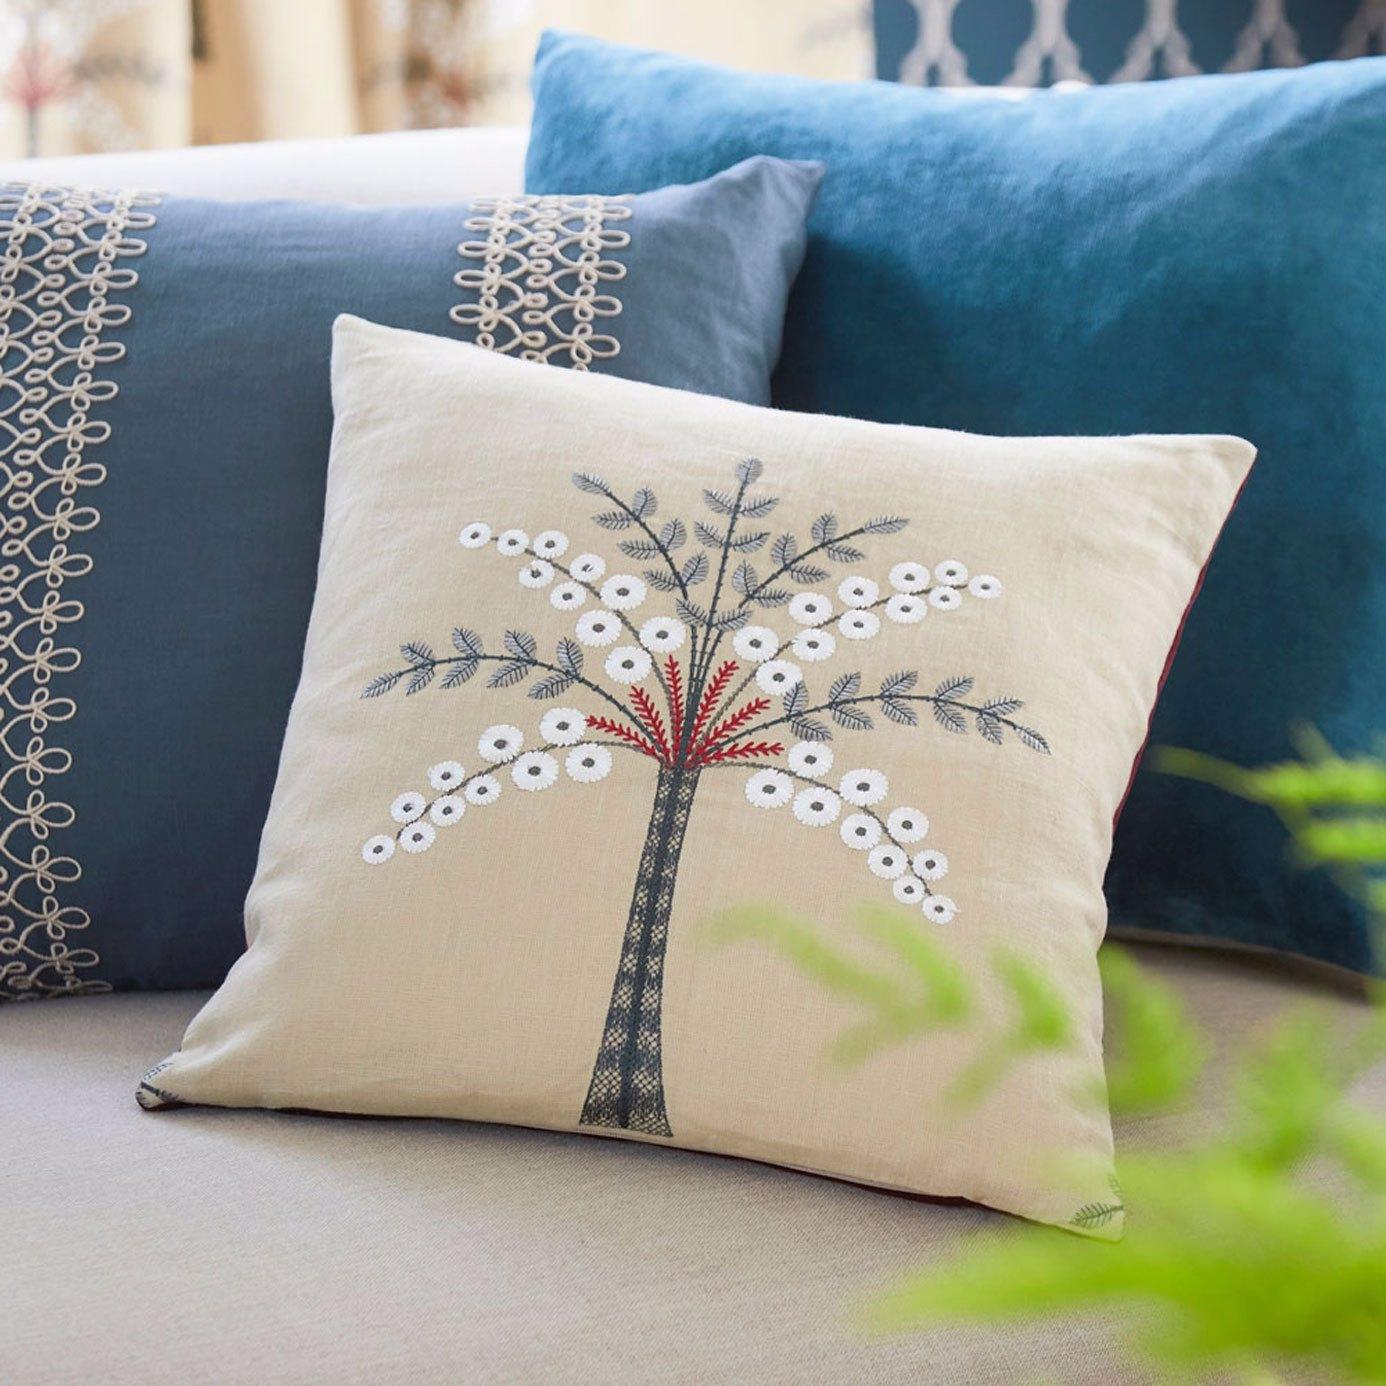 Palm Grove by SAN